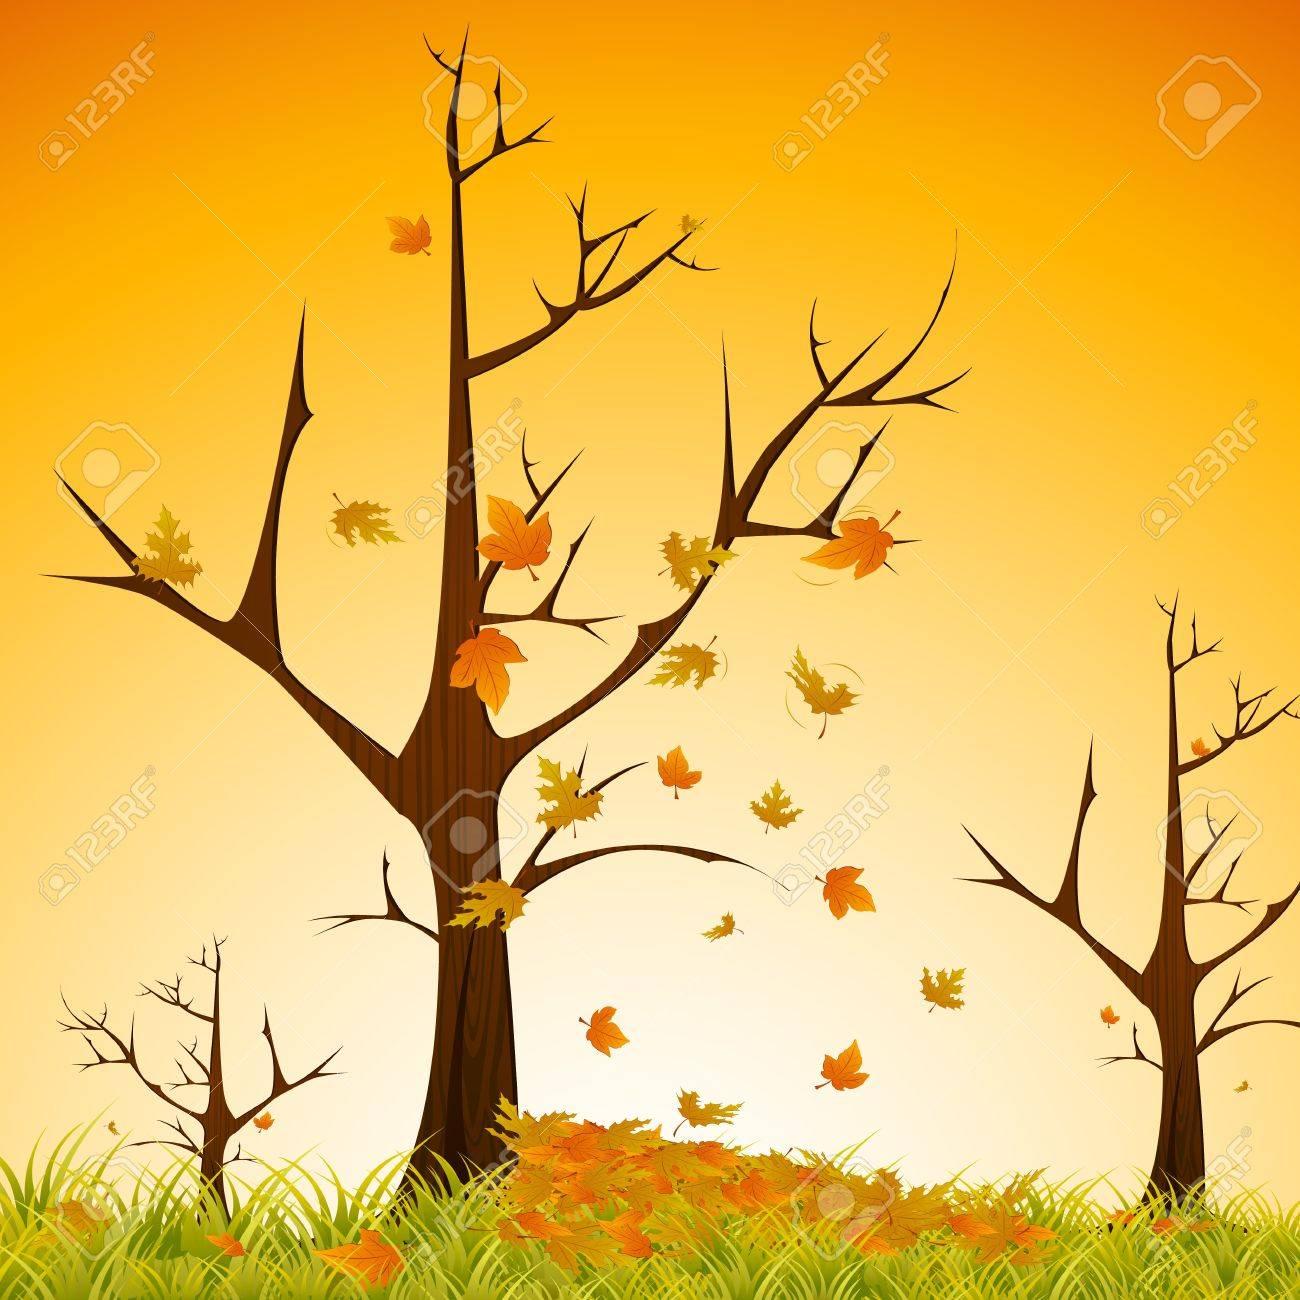 illustration of maple tree sheding leaves on natural background Stock Illustration - 10524581